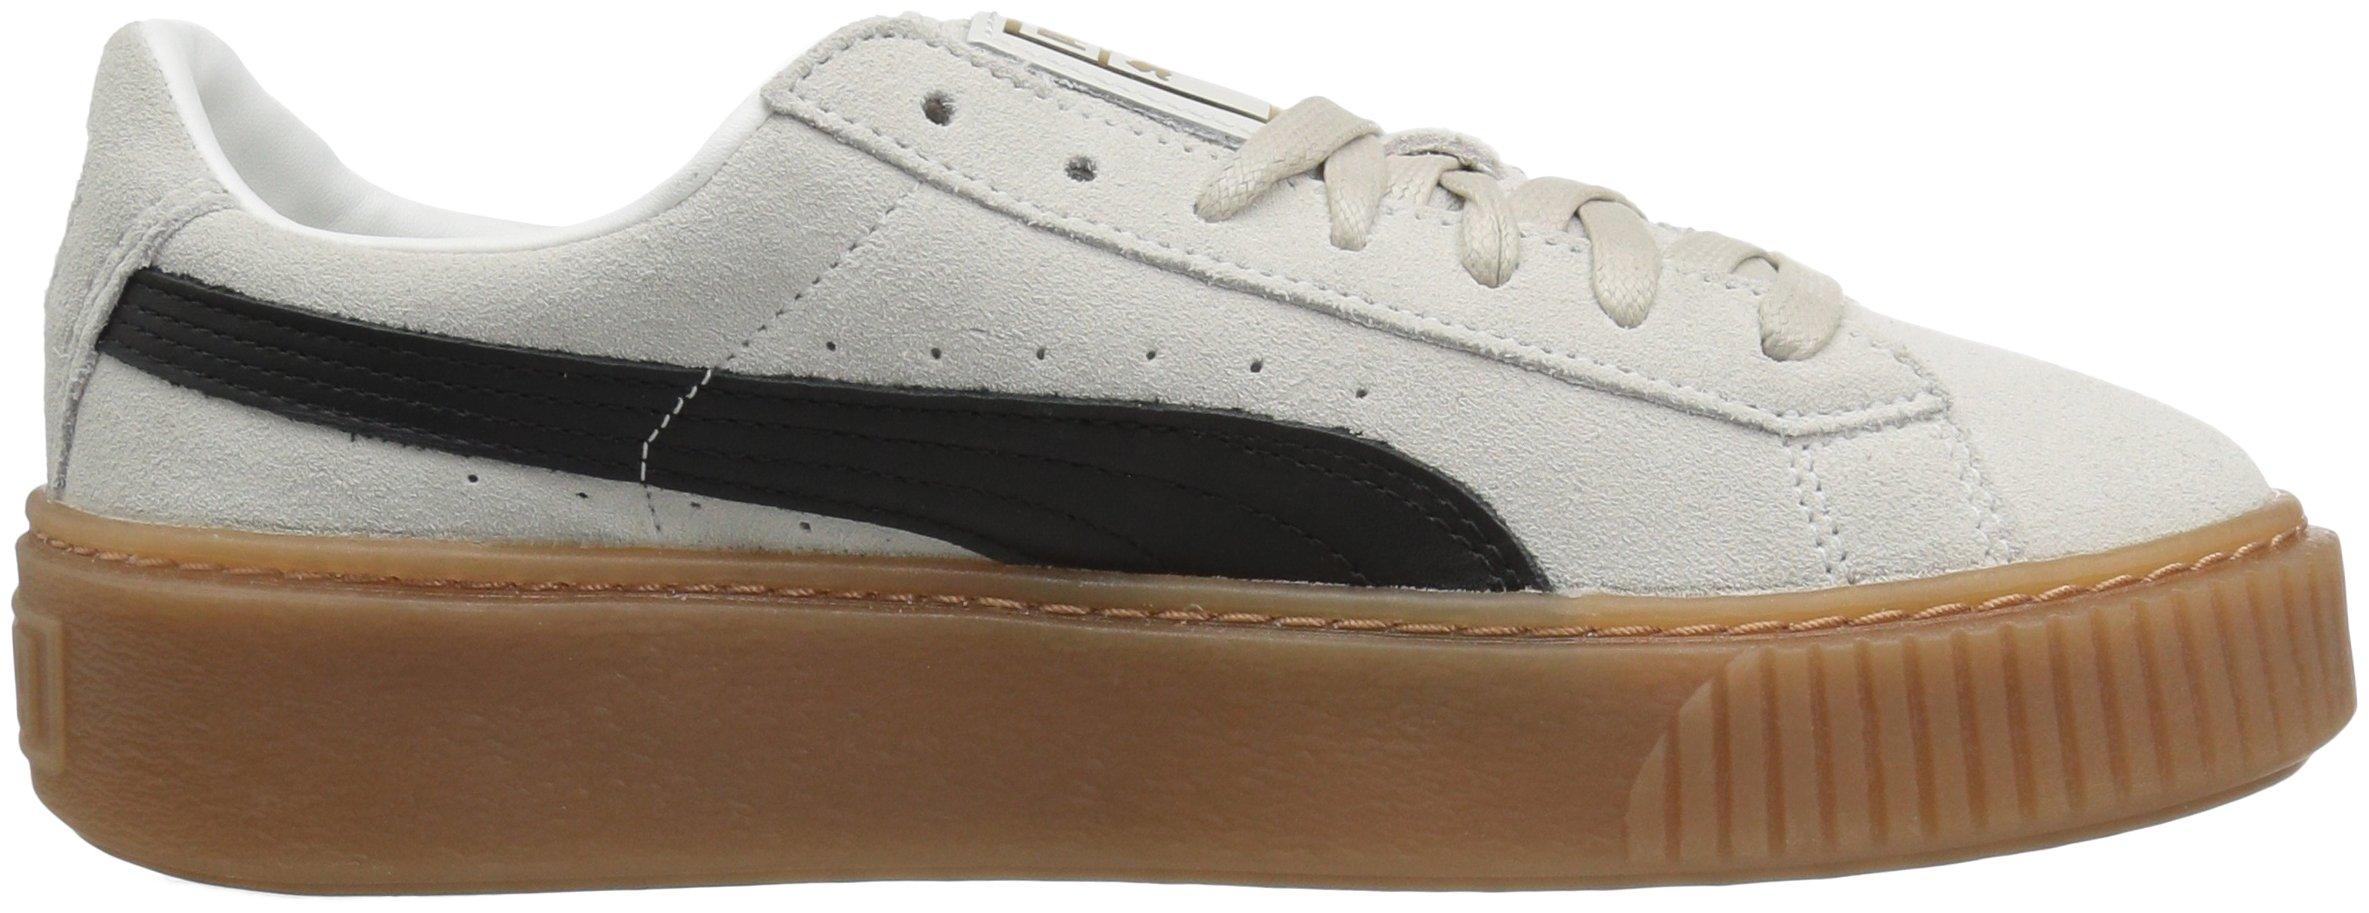 55f05290a450 PUMA - Puma Women s Suede Platform Core Whisper White   Black Ankle-High  Fashion Sneaker - 9M - Walmart.com